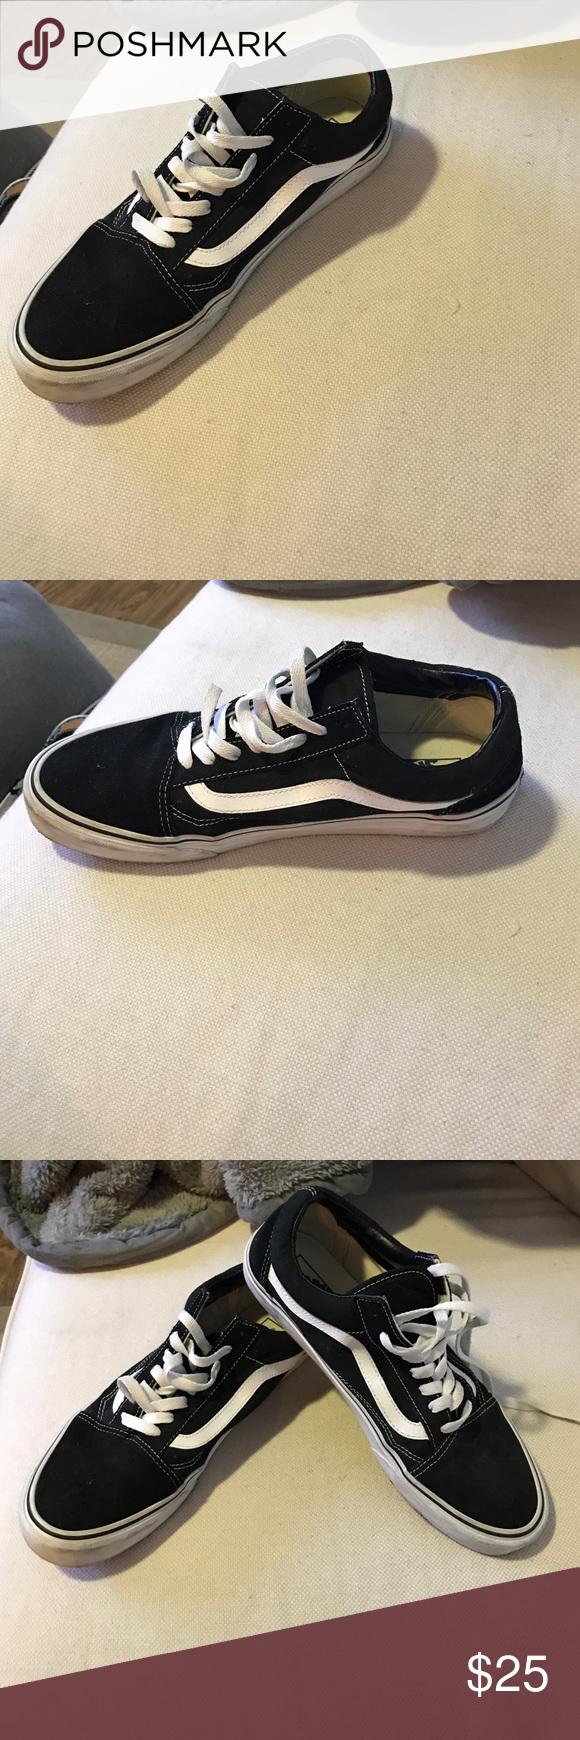 Vans old school sneakers Black and white old school shoes Vans Shoes Sneakers